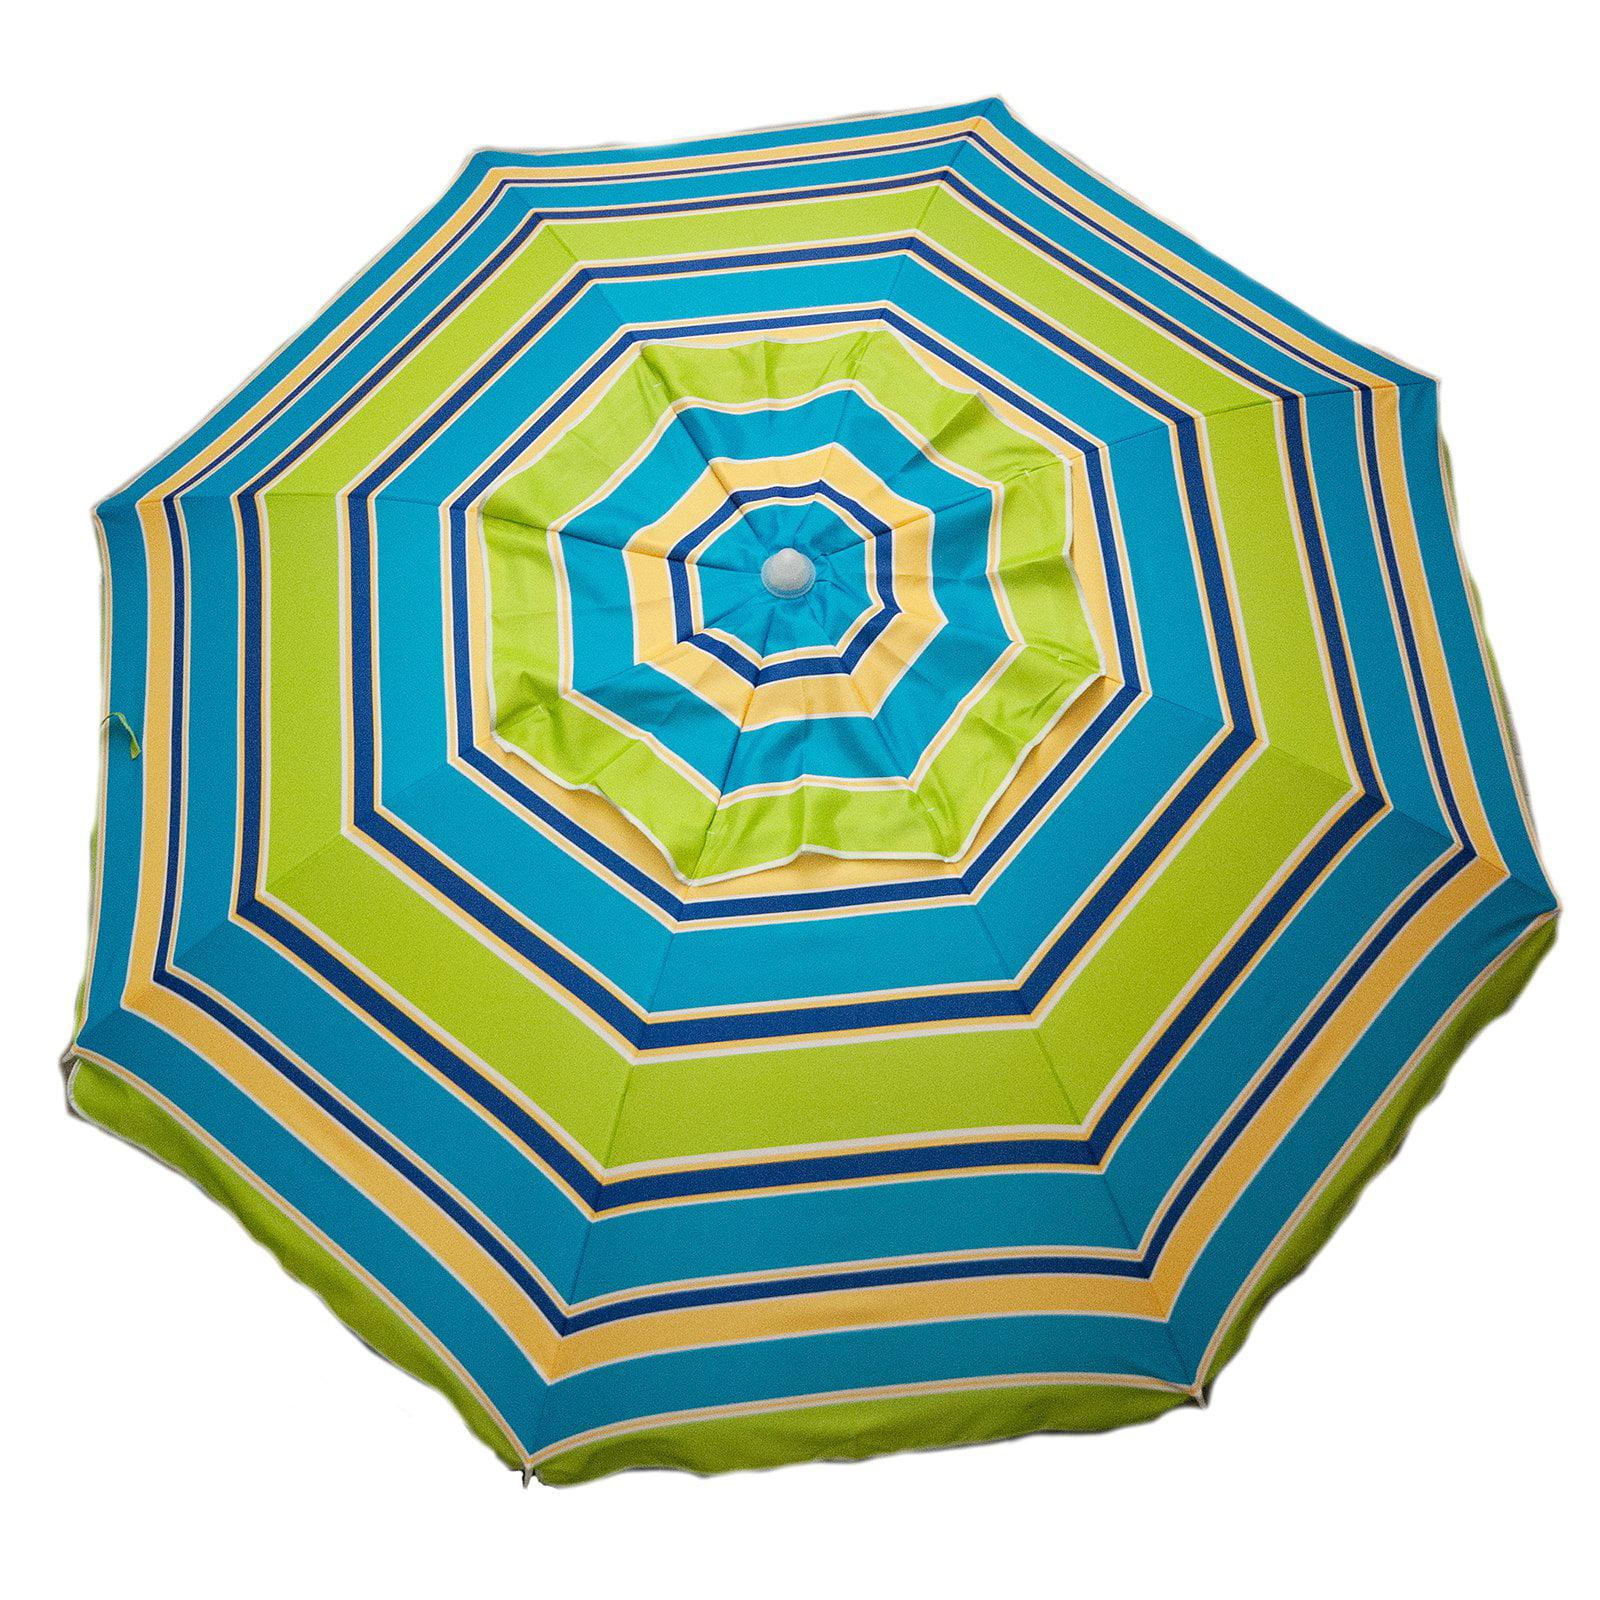 DestinationGear 7' Beach Umbrella Lime Stripe With Travel Bag by Parasol